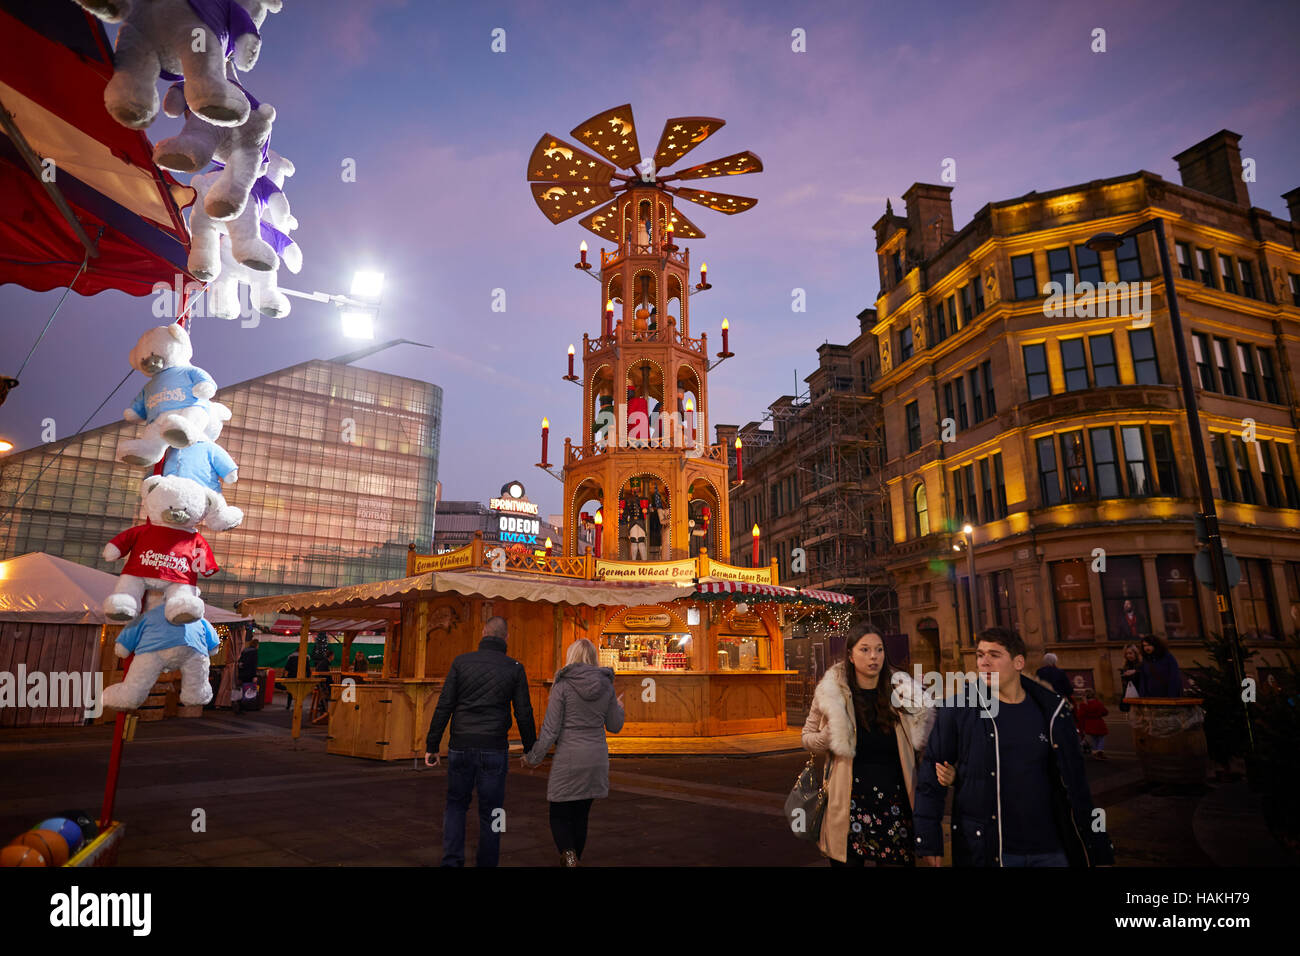 Manchester stalls christmas football museum    sunset german markets night dusk dawn Christmas winter festive festival - Stock Image